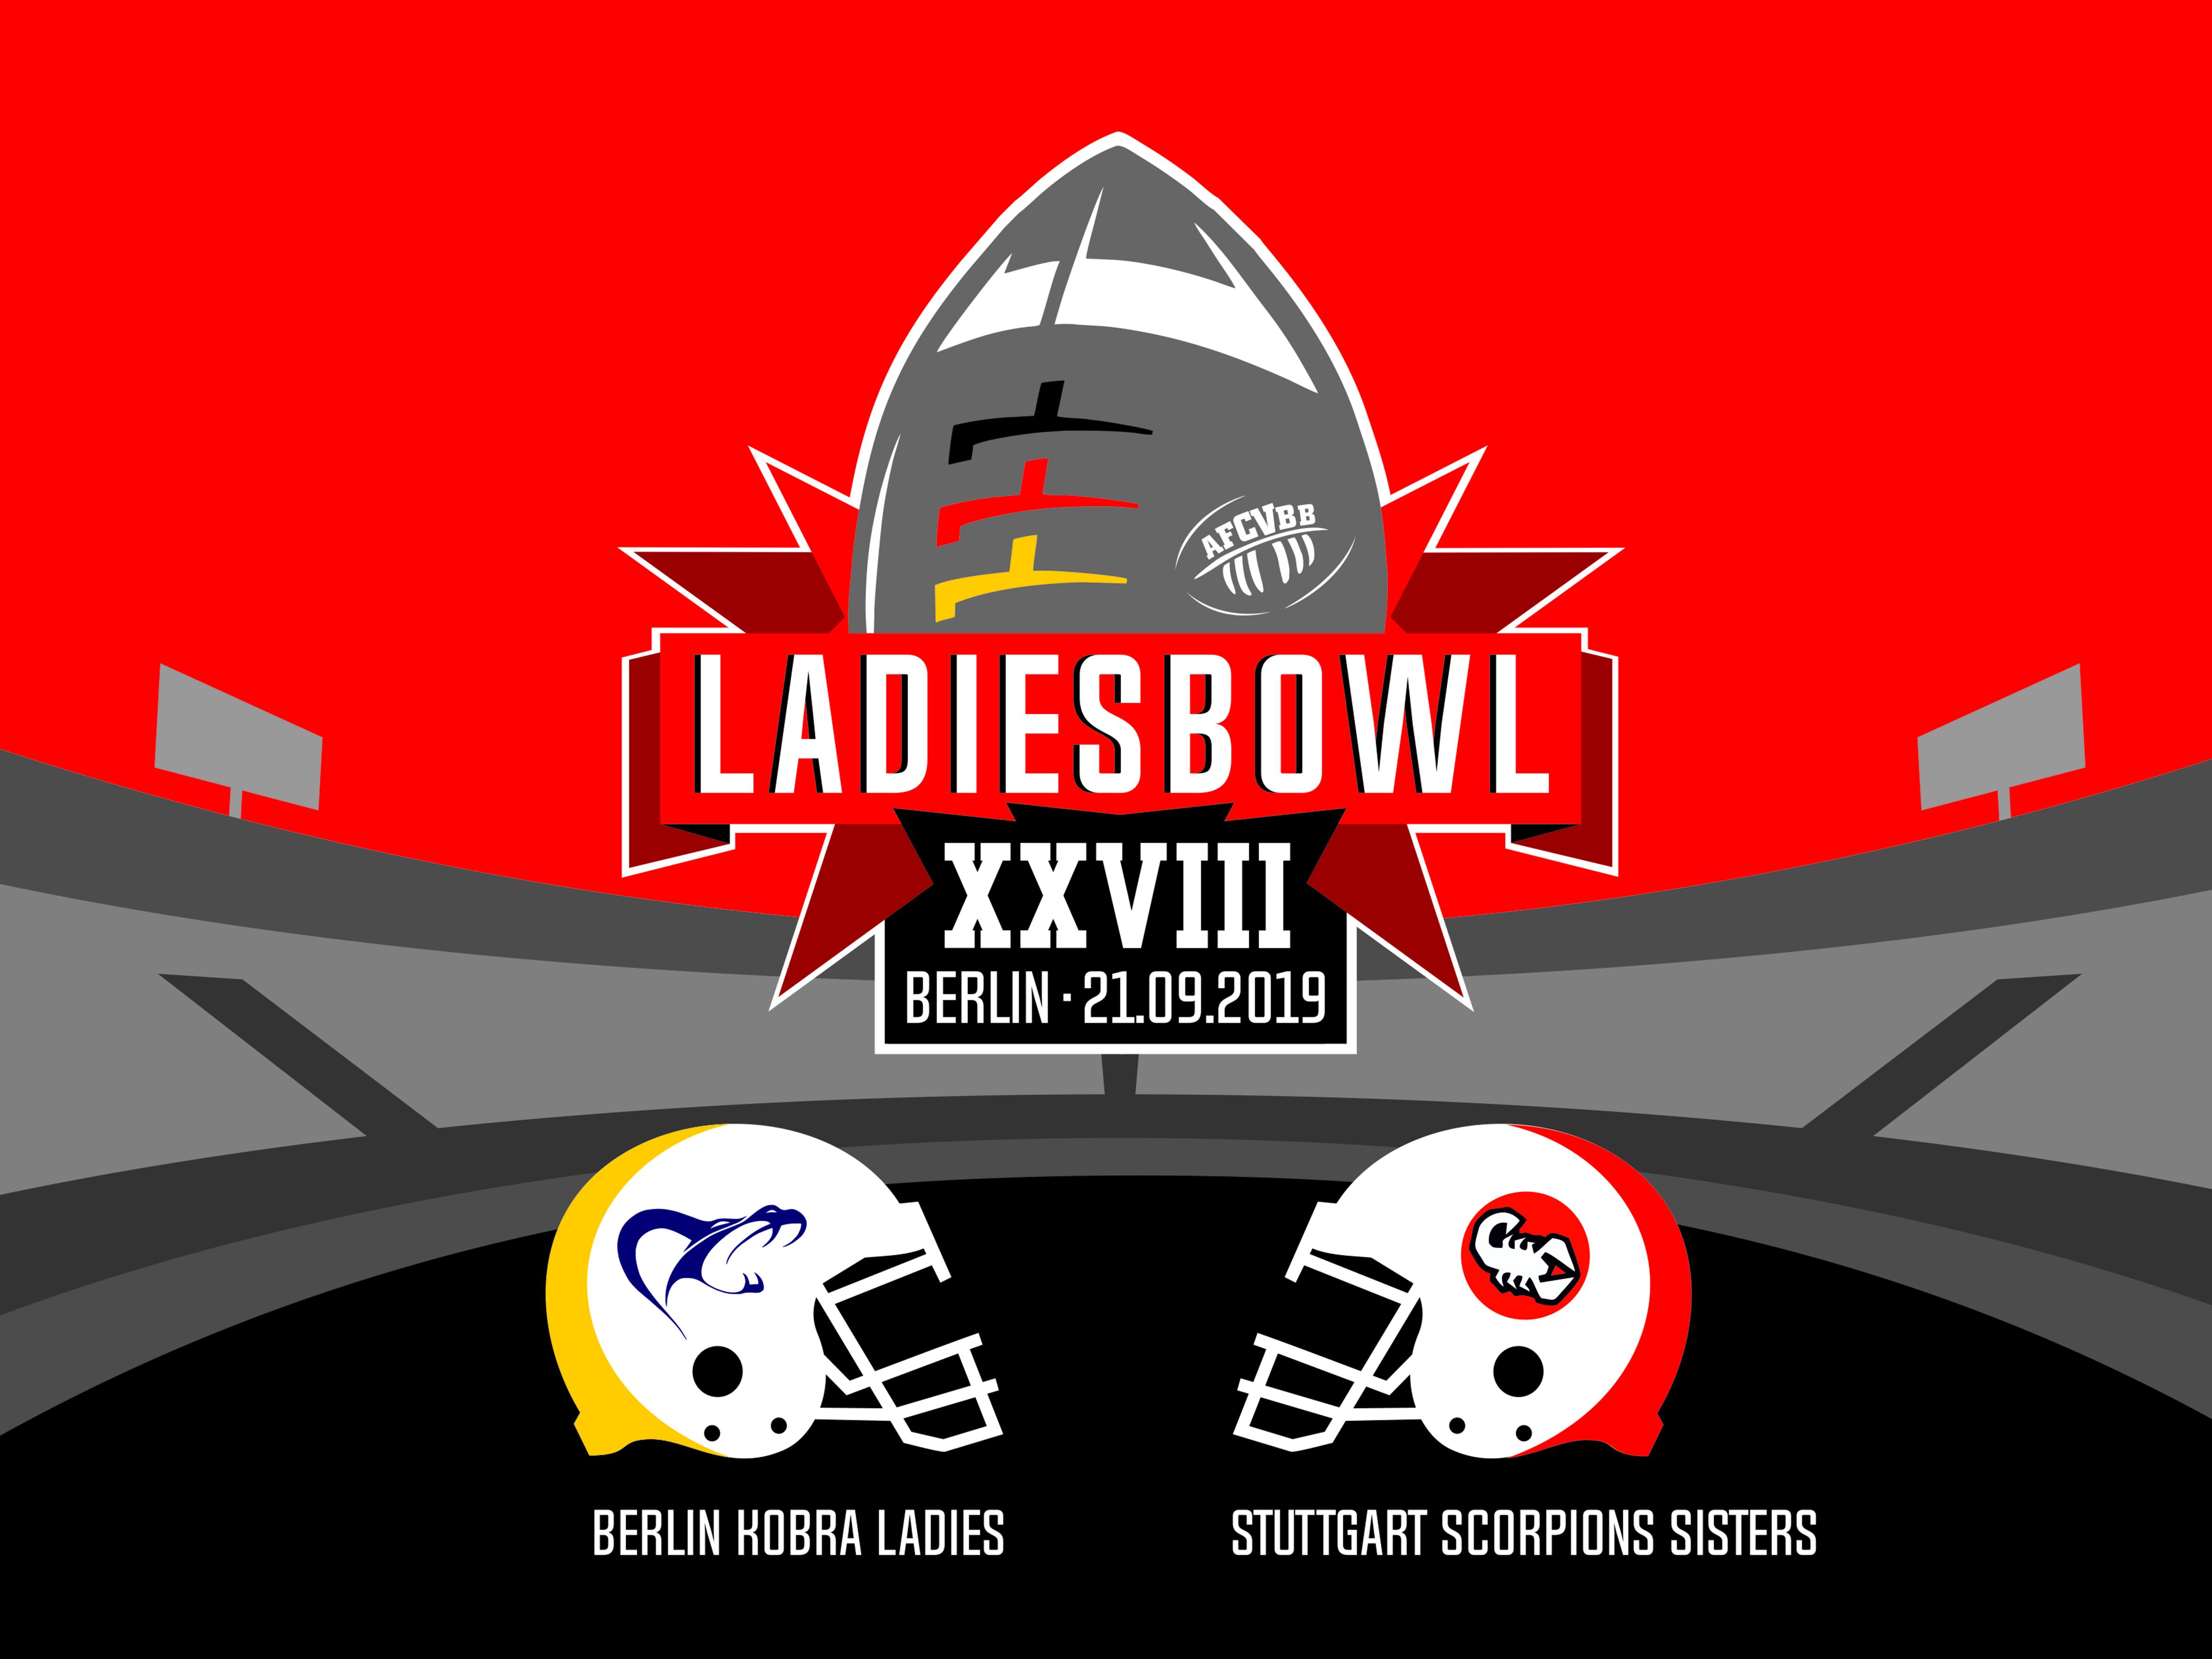 Livestream: Ladies Bowl XXVIII